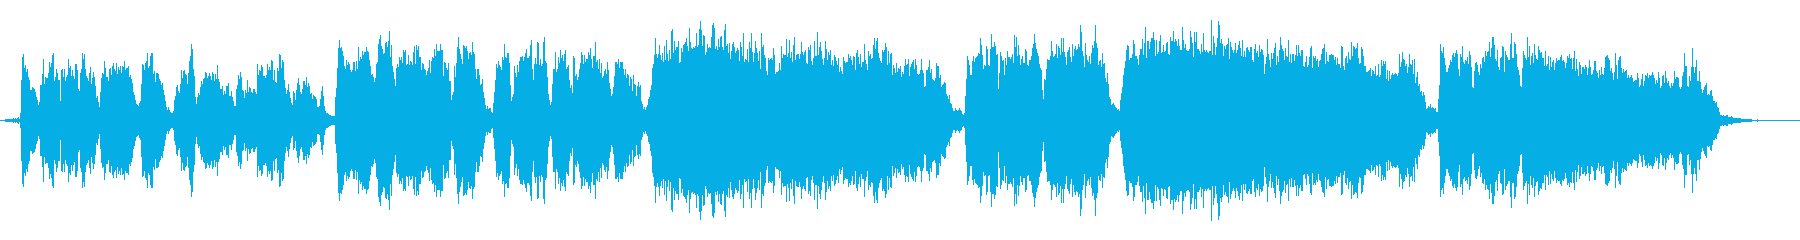 Jazzyなハーモニーのクリスマスソングの再生済みの波形